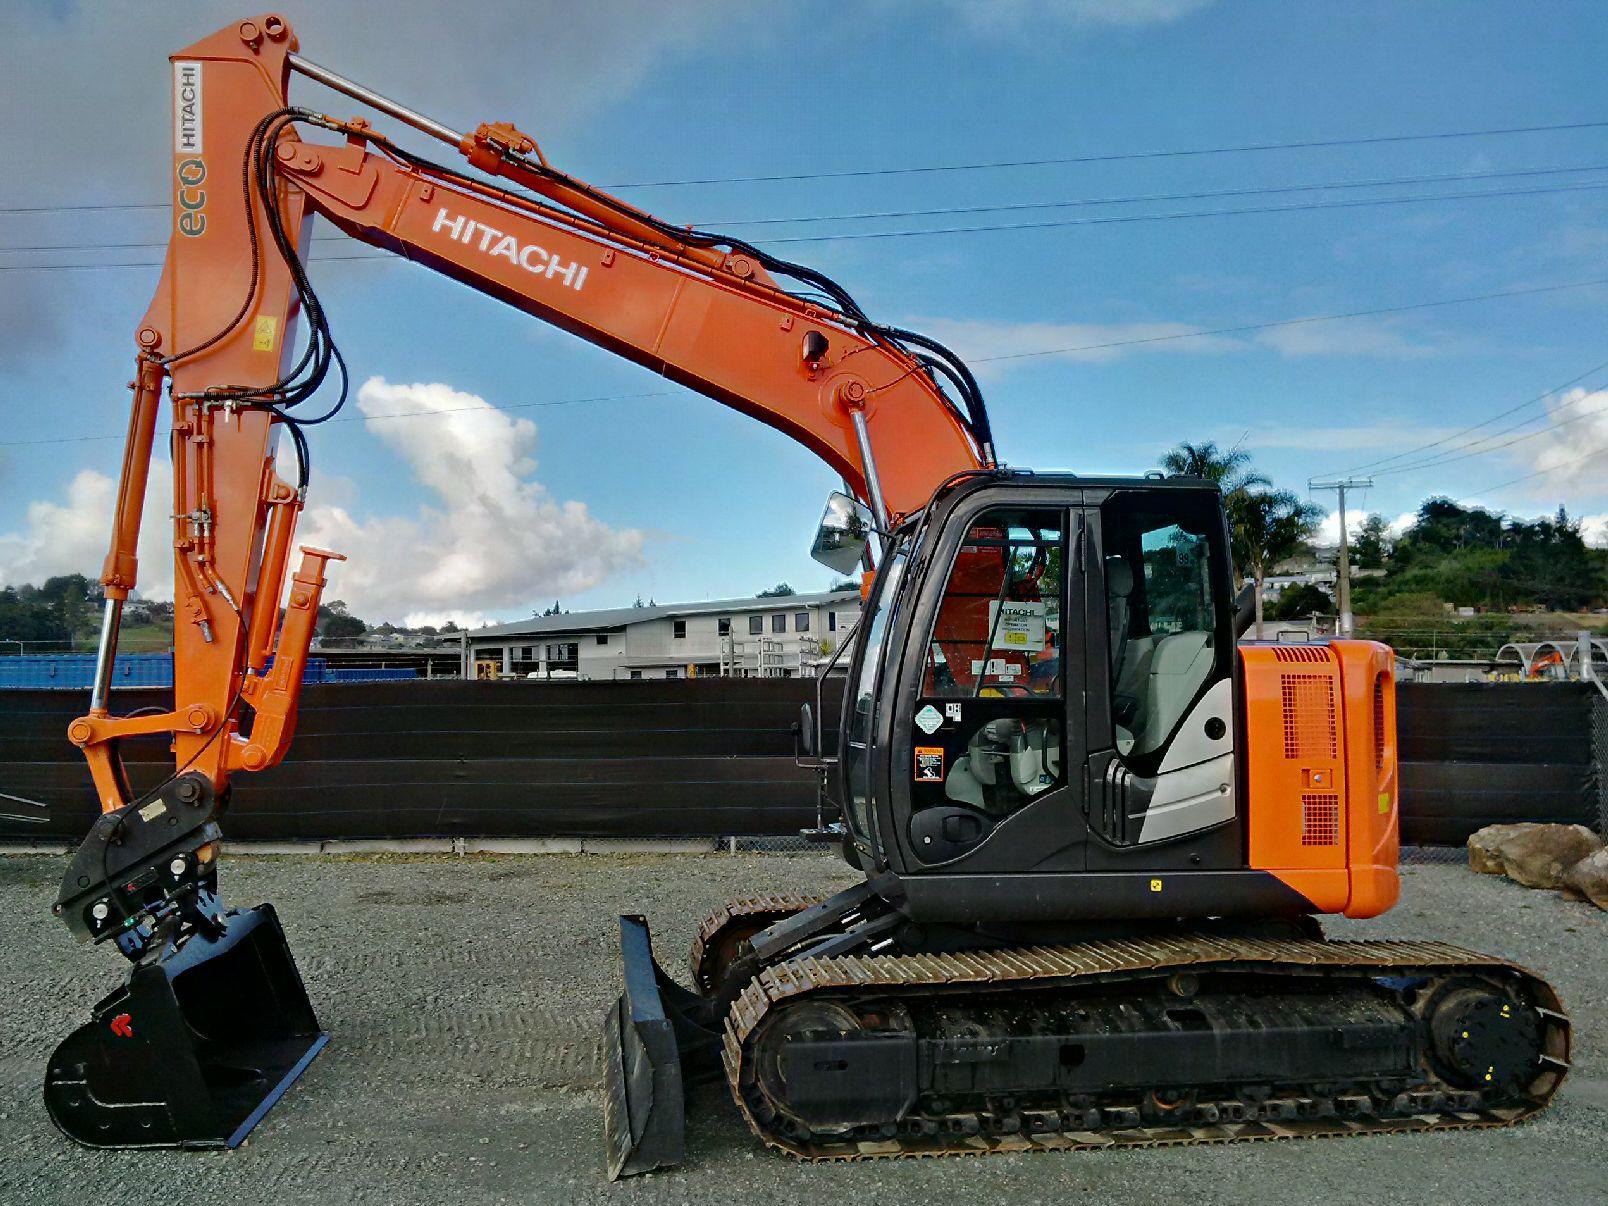 2014 Hitachi ZX135US-5B - fitted with Robur tilt bucket & Chubbs thumb